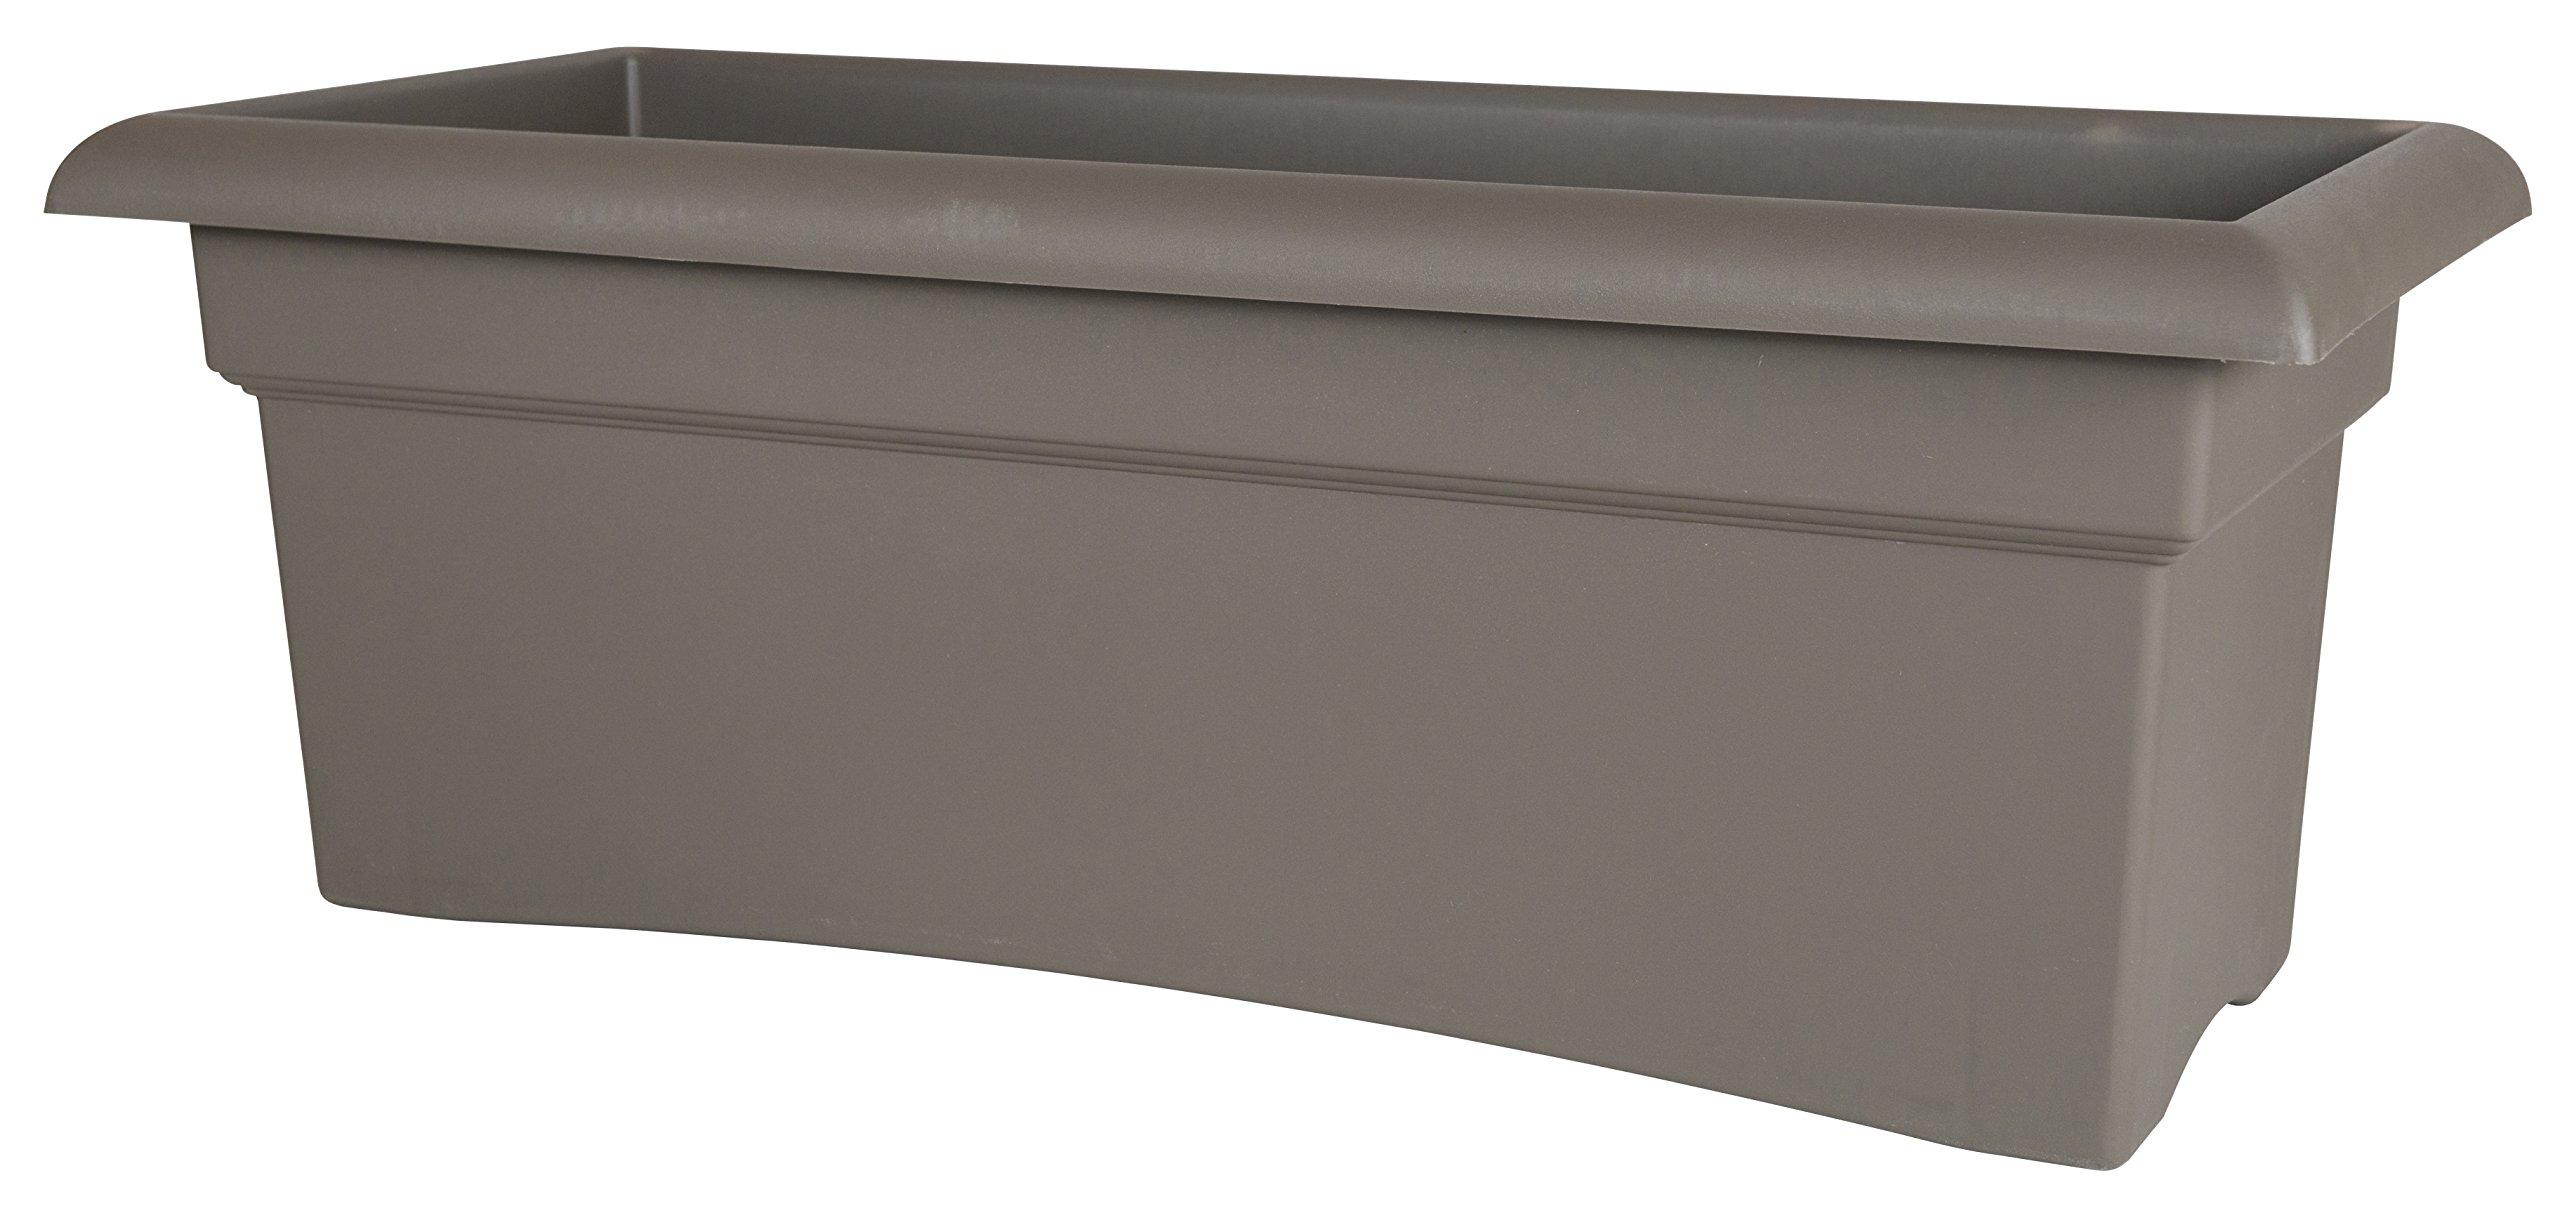 Bloem Fiskars 26 Inch Veranda 3 Gallon Rectangular Planter, Color Cement (57726)